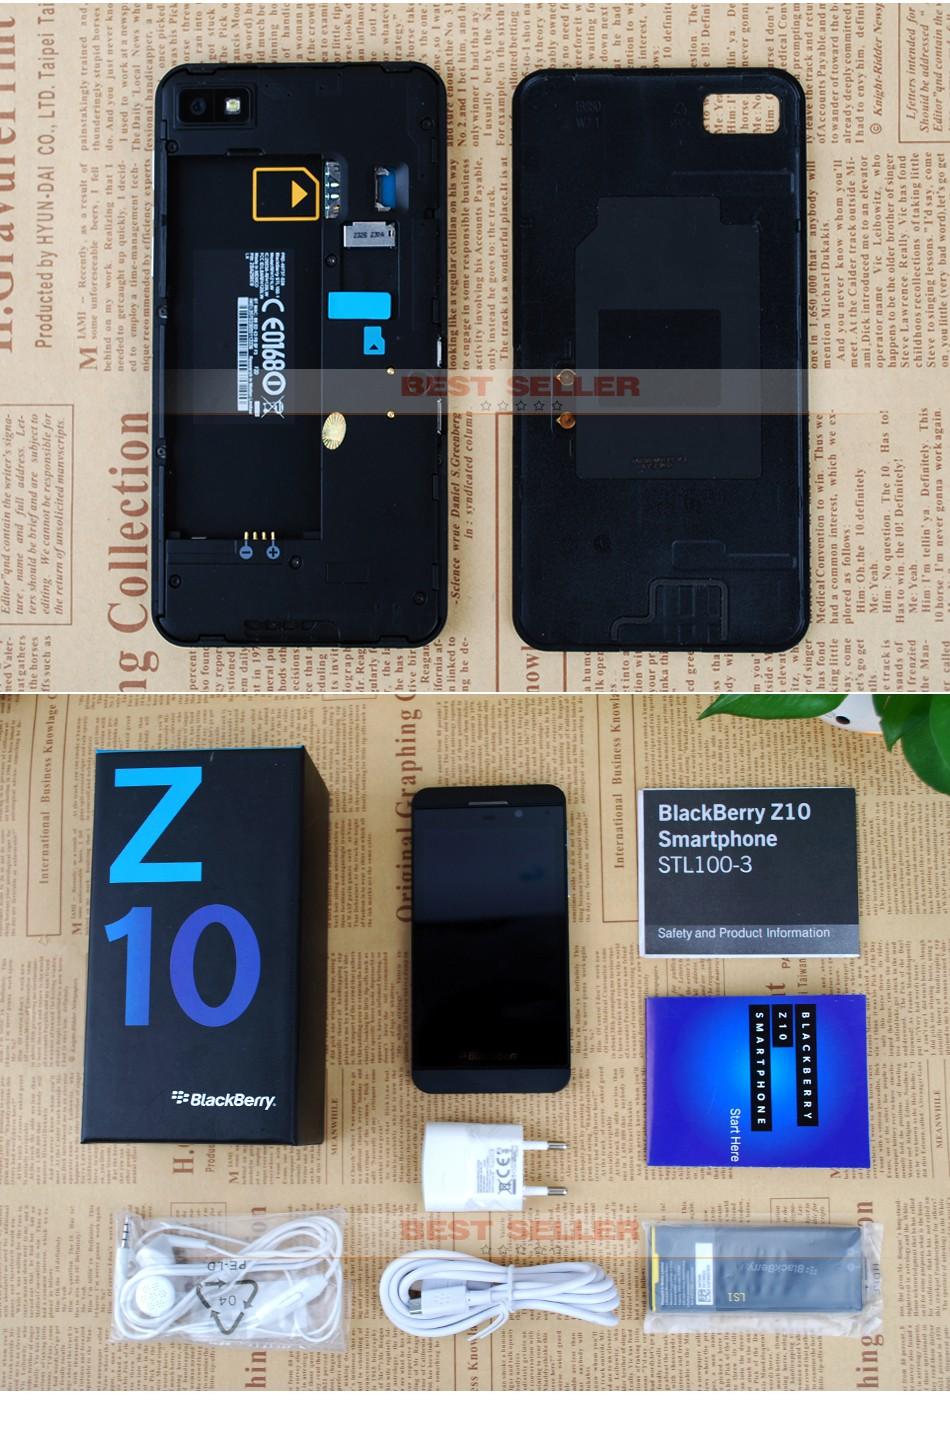 Unlocked Original Blackberry Z10 3G 4G Smartphones NFC GPS WIFI 4.2 inch Touch Mobile Phones 2+16GB white 5